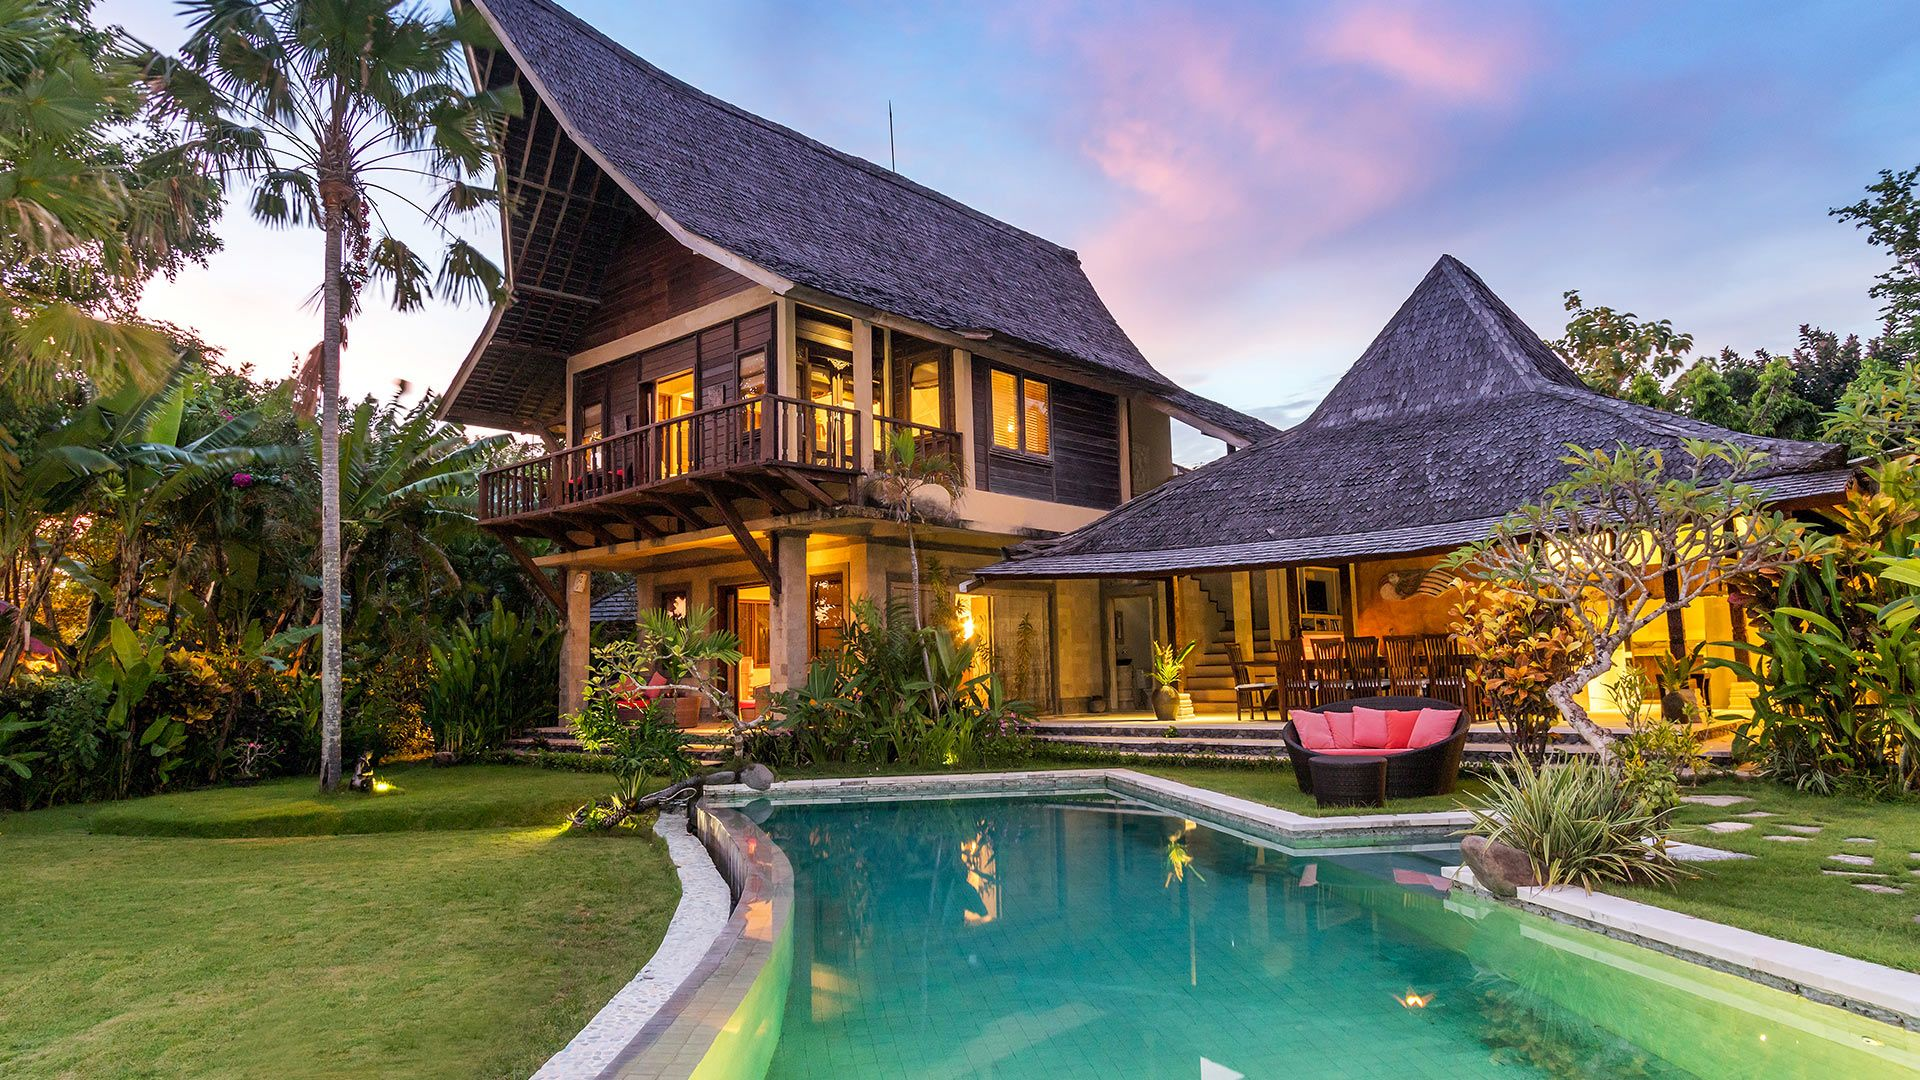 Villa Bunga Desa Bali Fabulous villa 7 bedrooms with